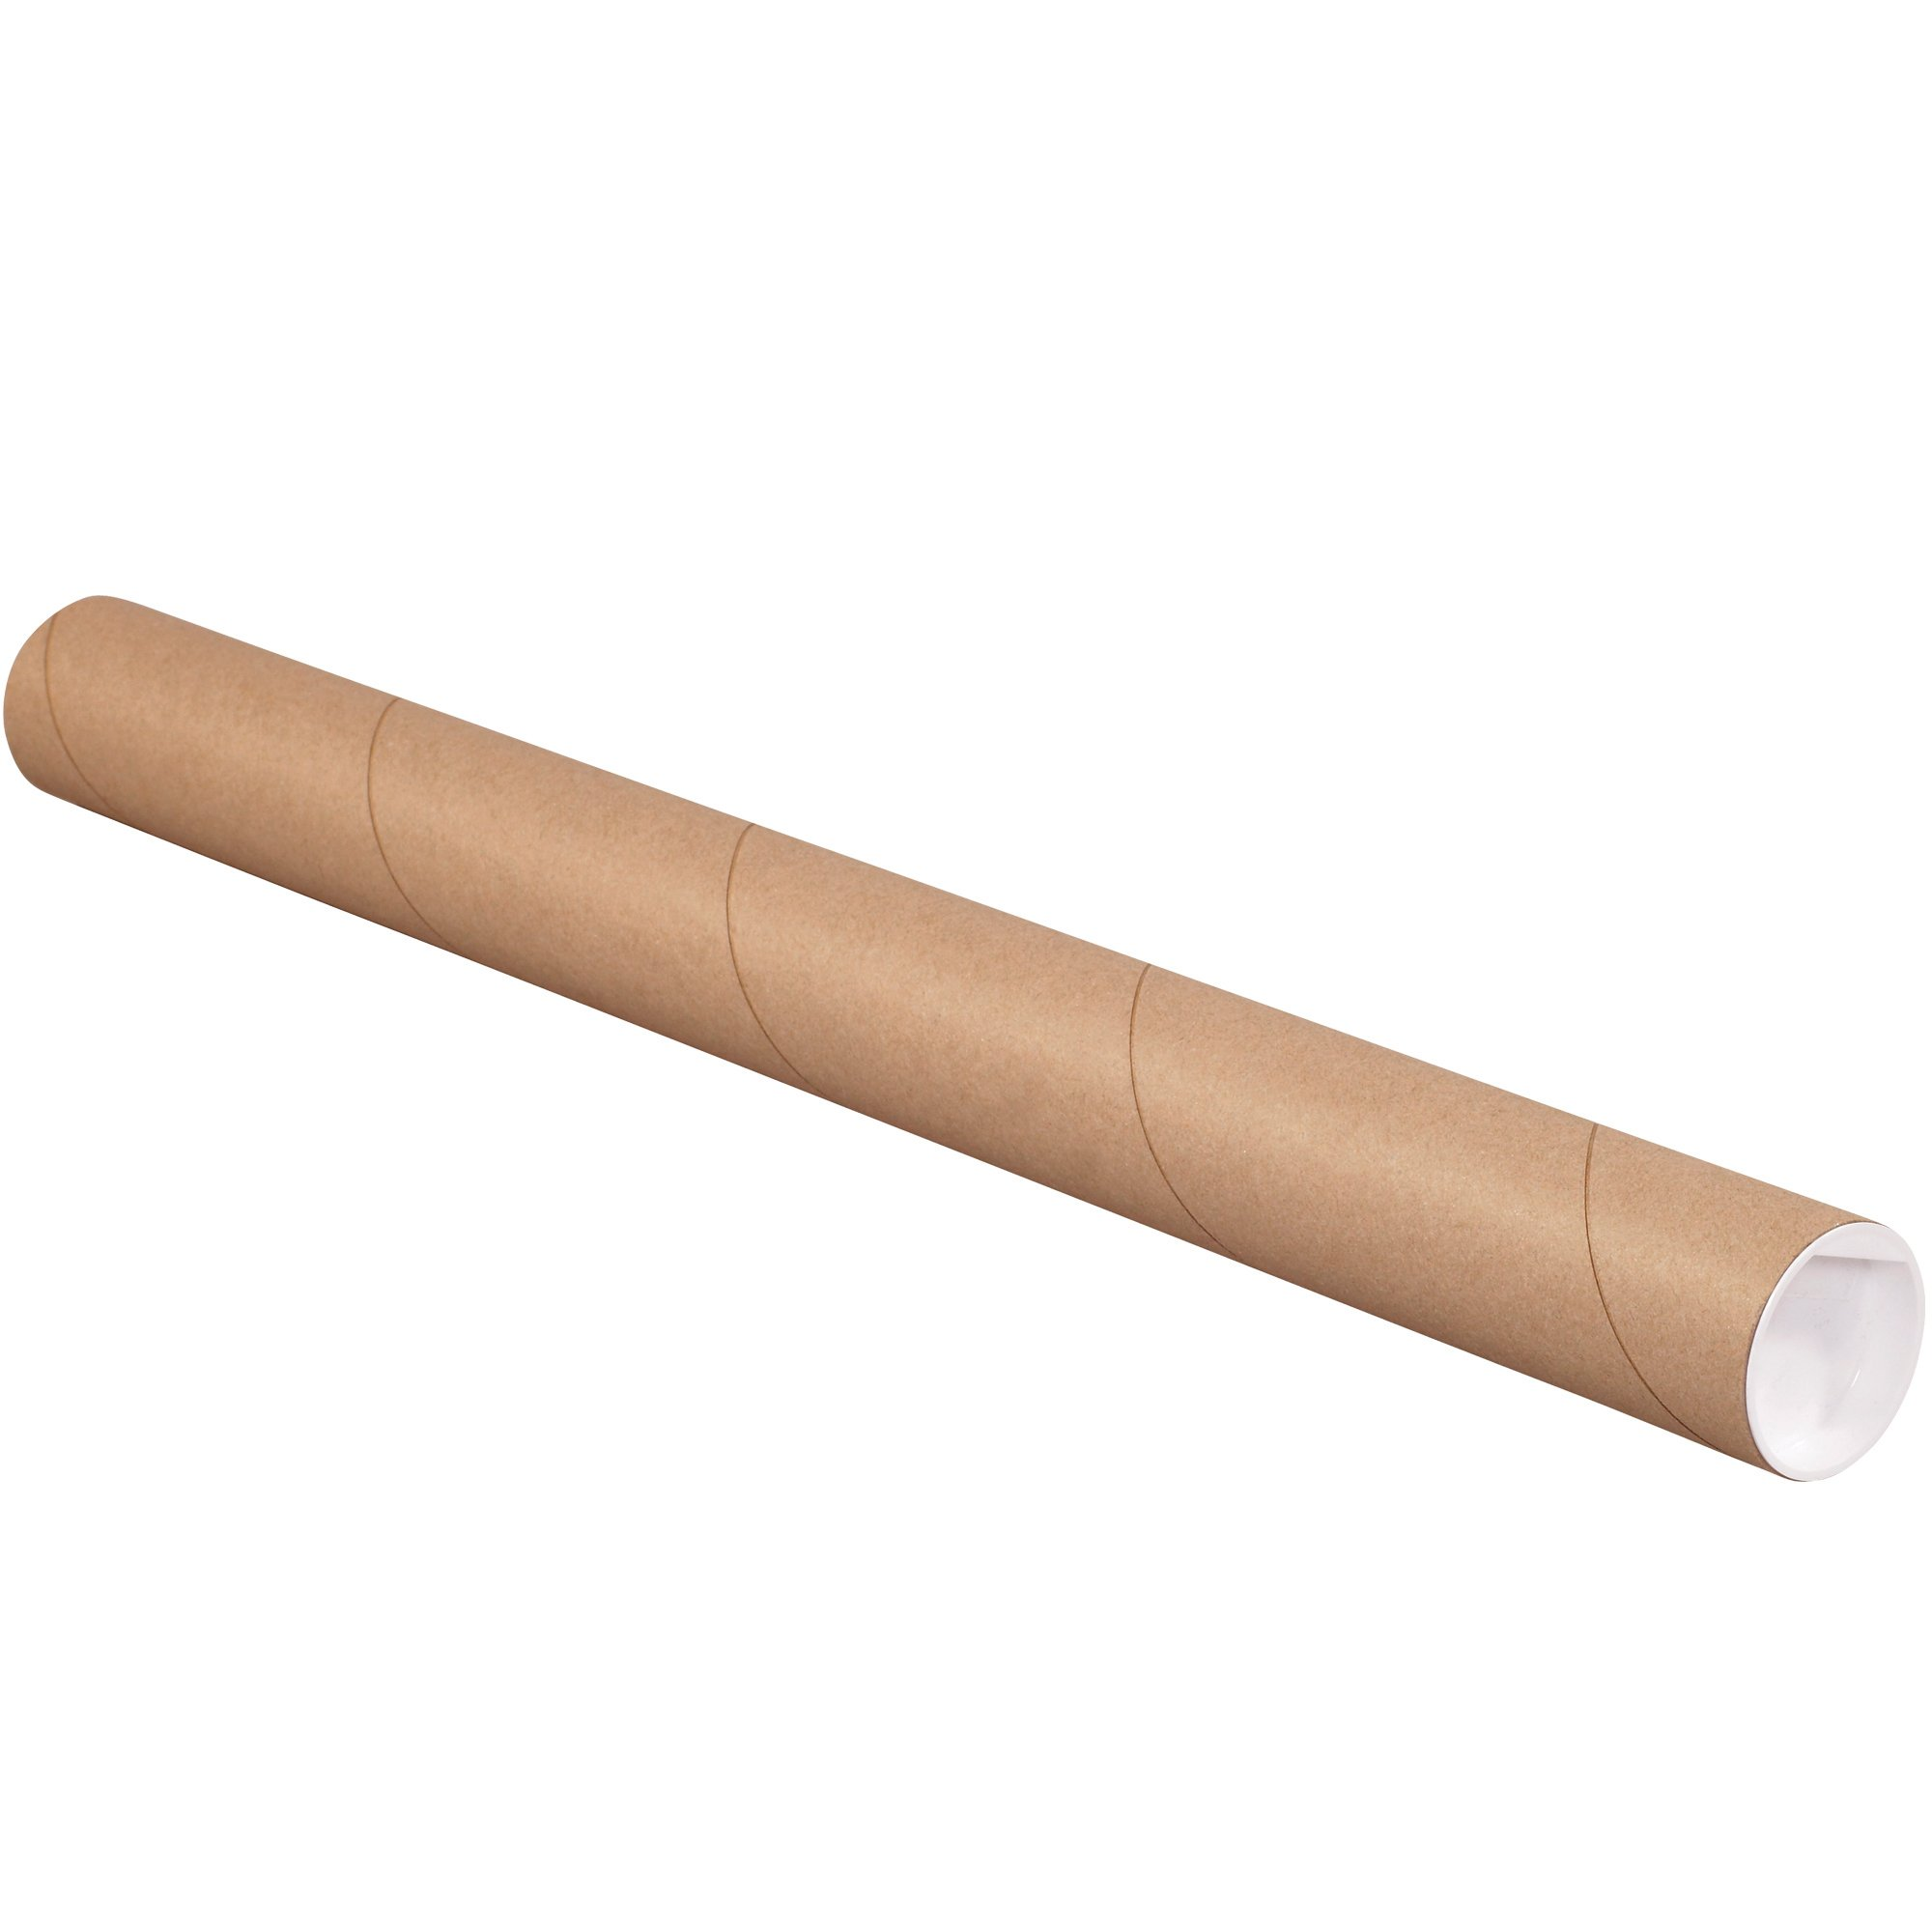 Aviditi P2015K Mailing Tubes with Caps, 2'' x 15'', Kraft (Pack of 50) by Aviditi